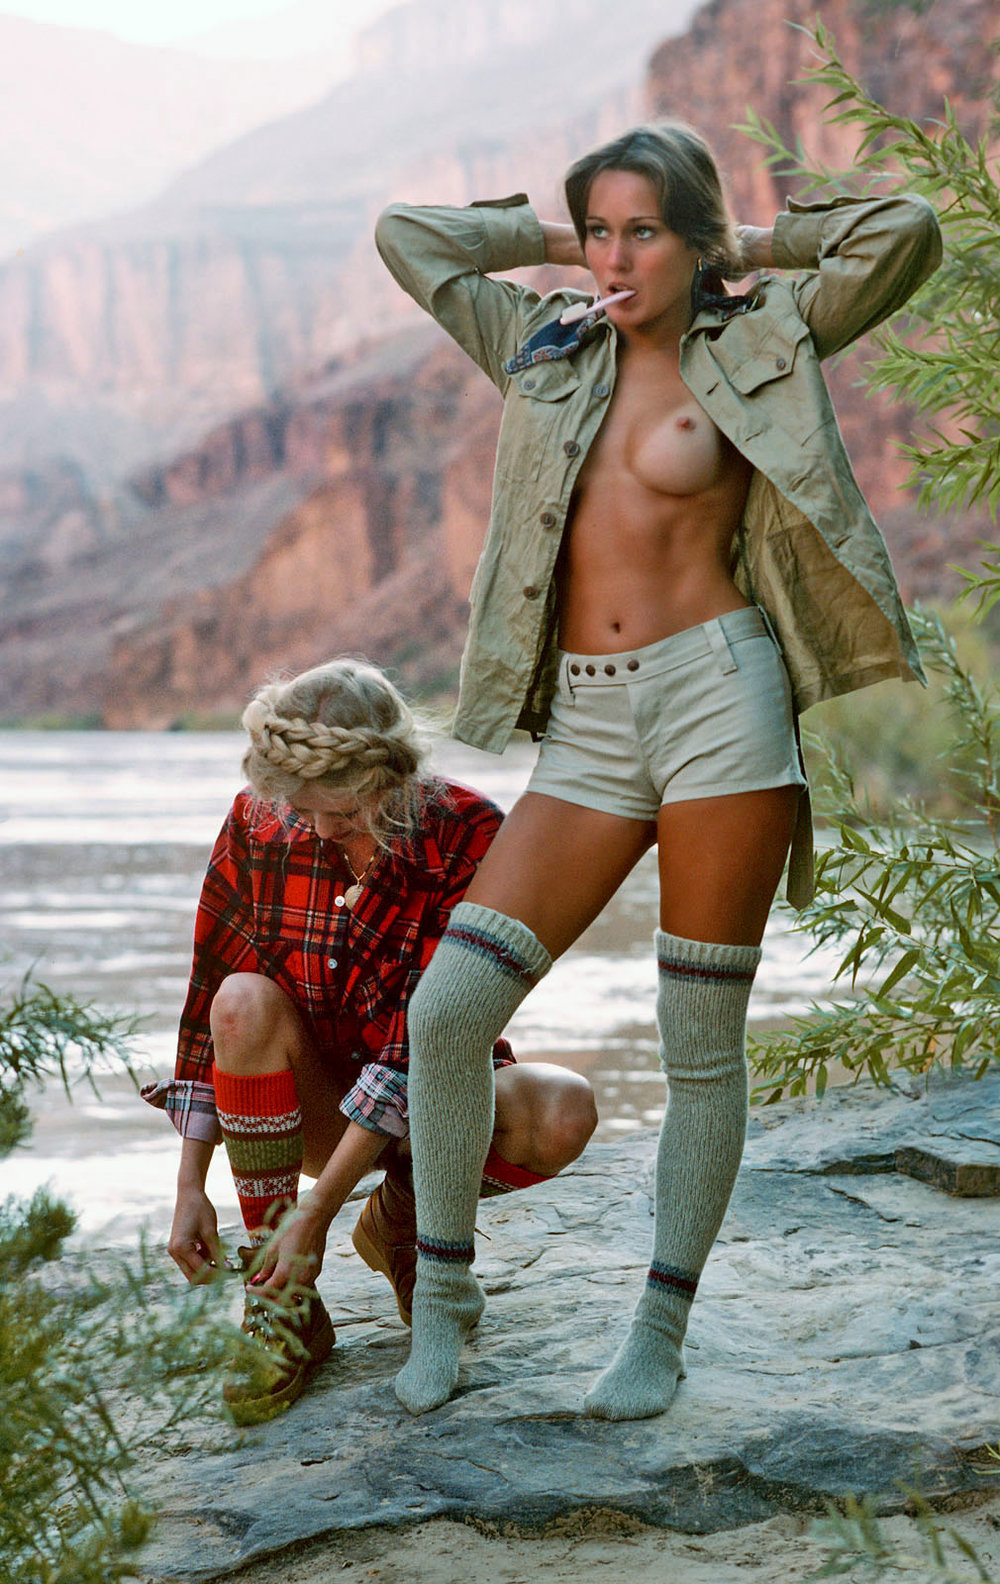 hope-olson-riverboa-gambolers-playboy-magazine-1977